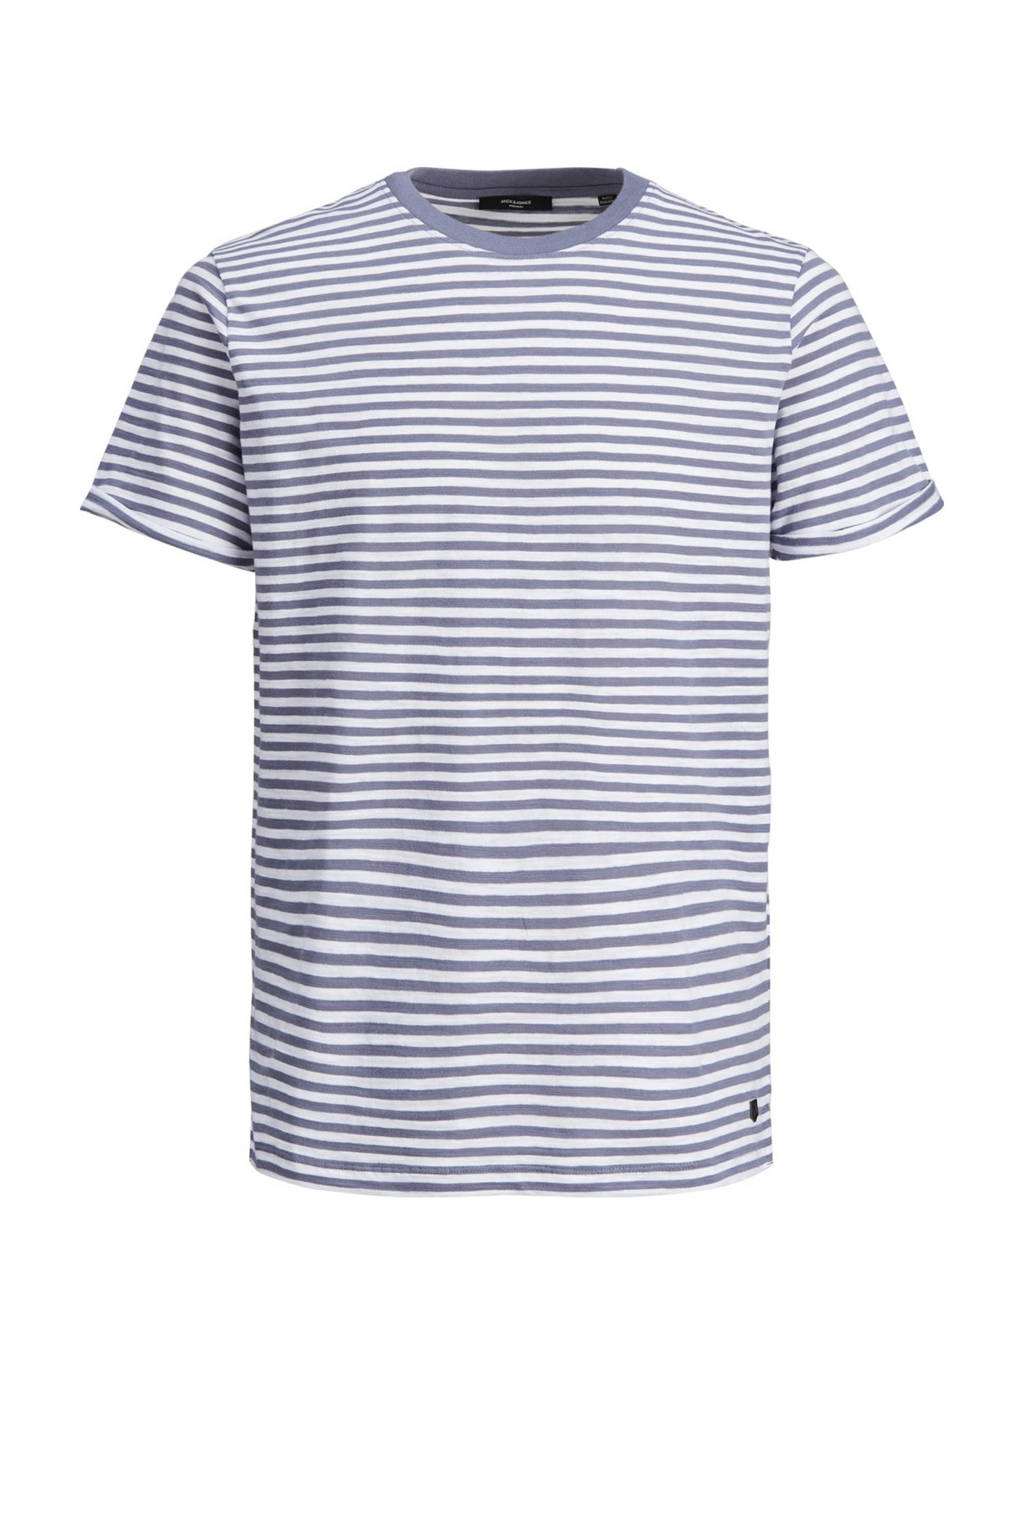 JACK & JONES PREMIUM gestreept T-shirt Blabeach atlantic blue, Atlantic Blue